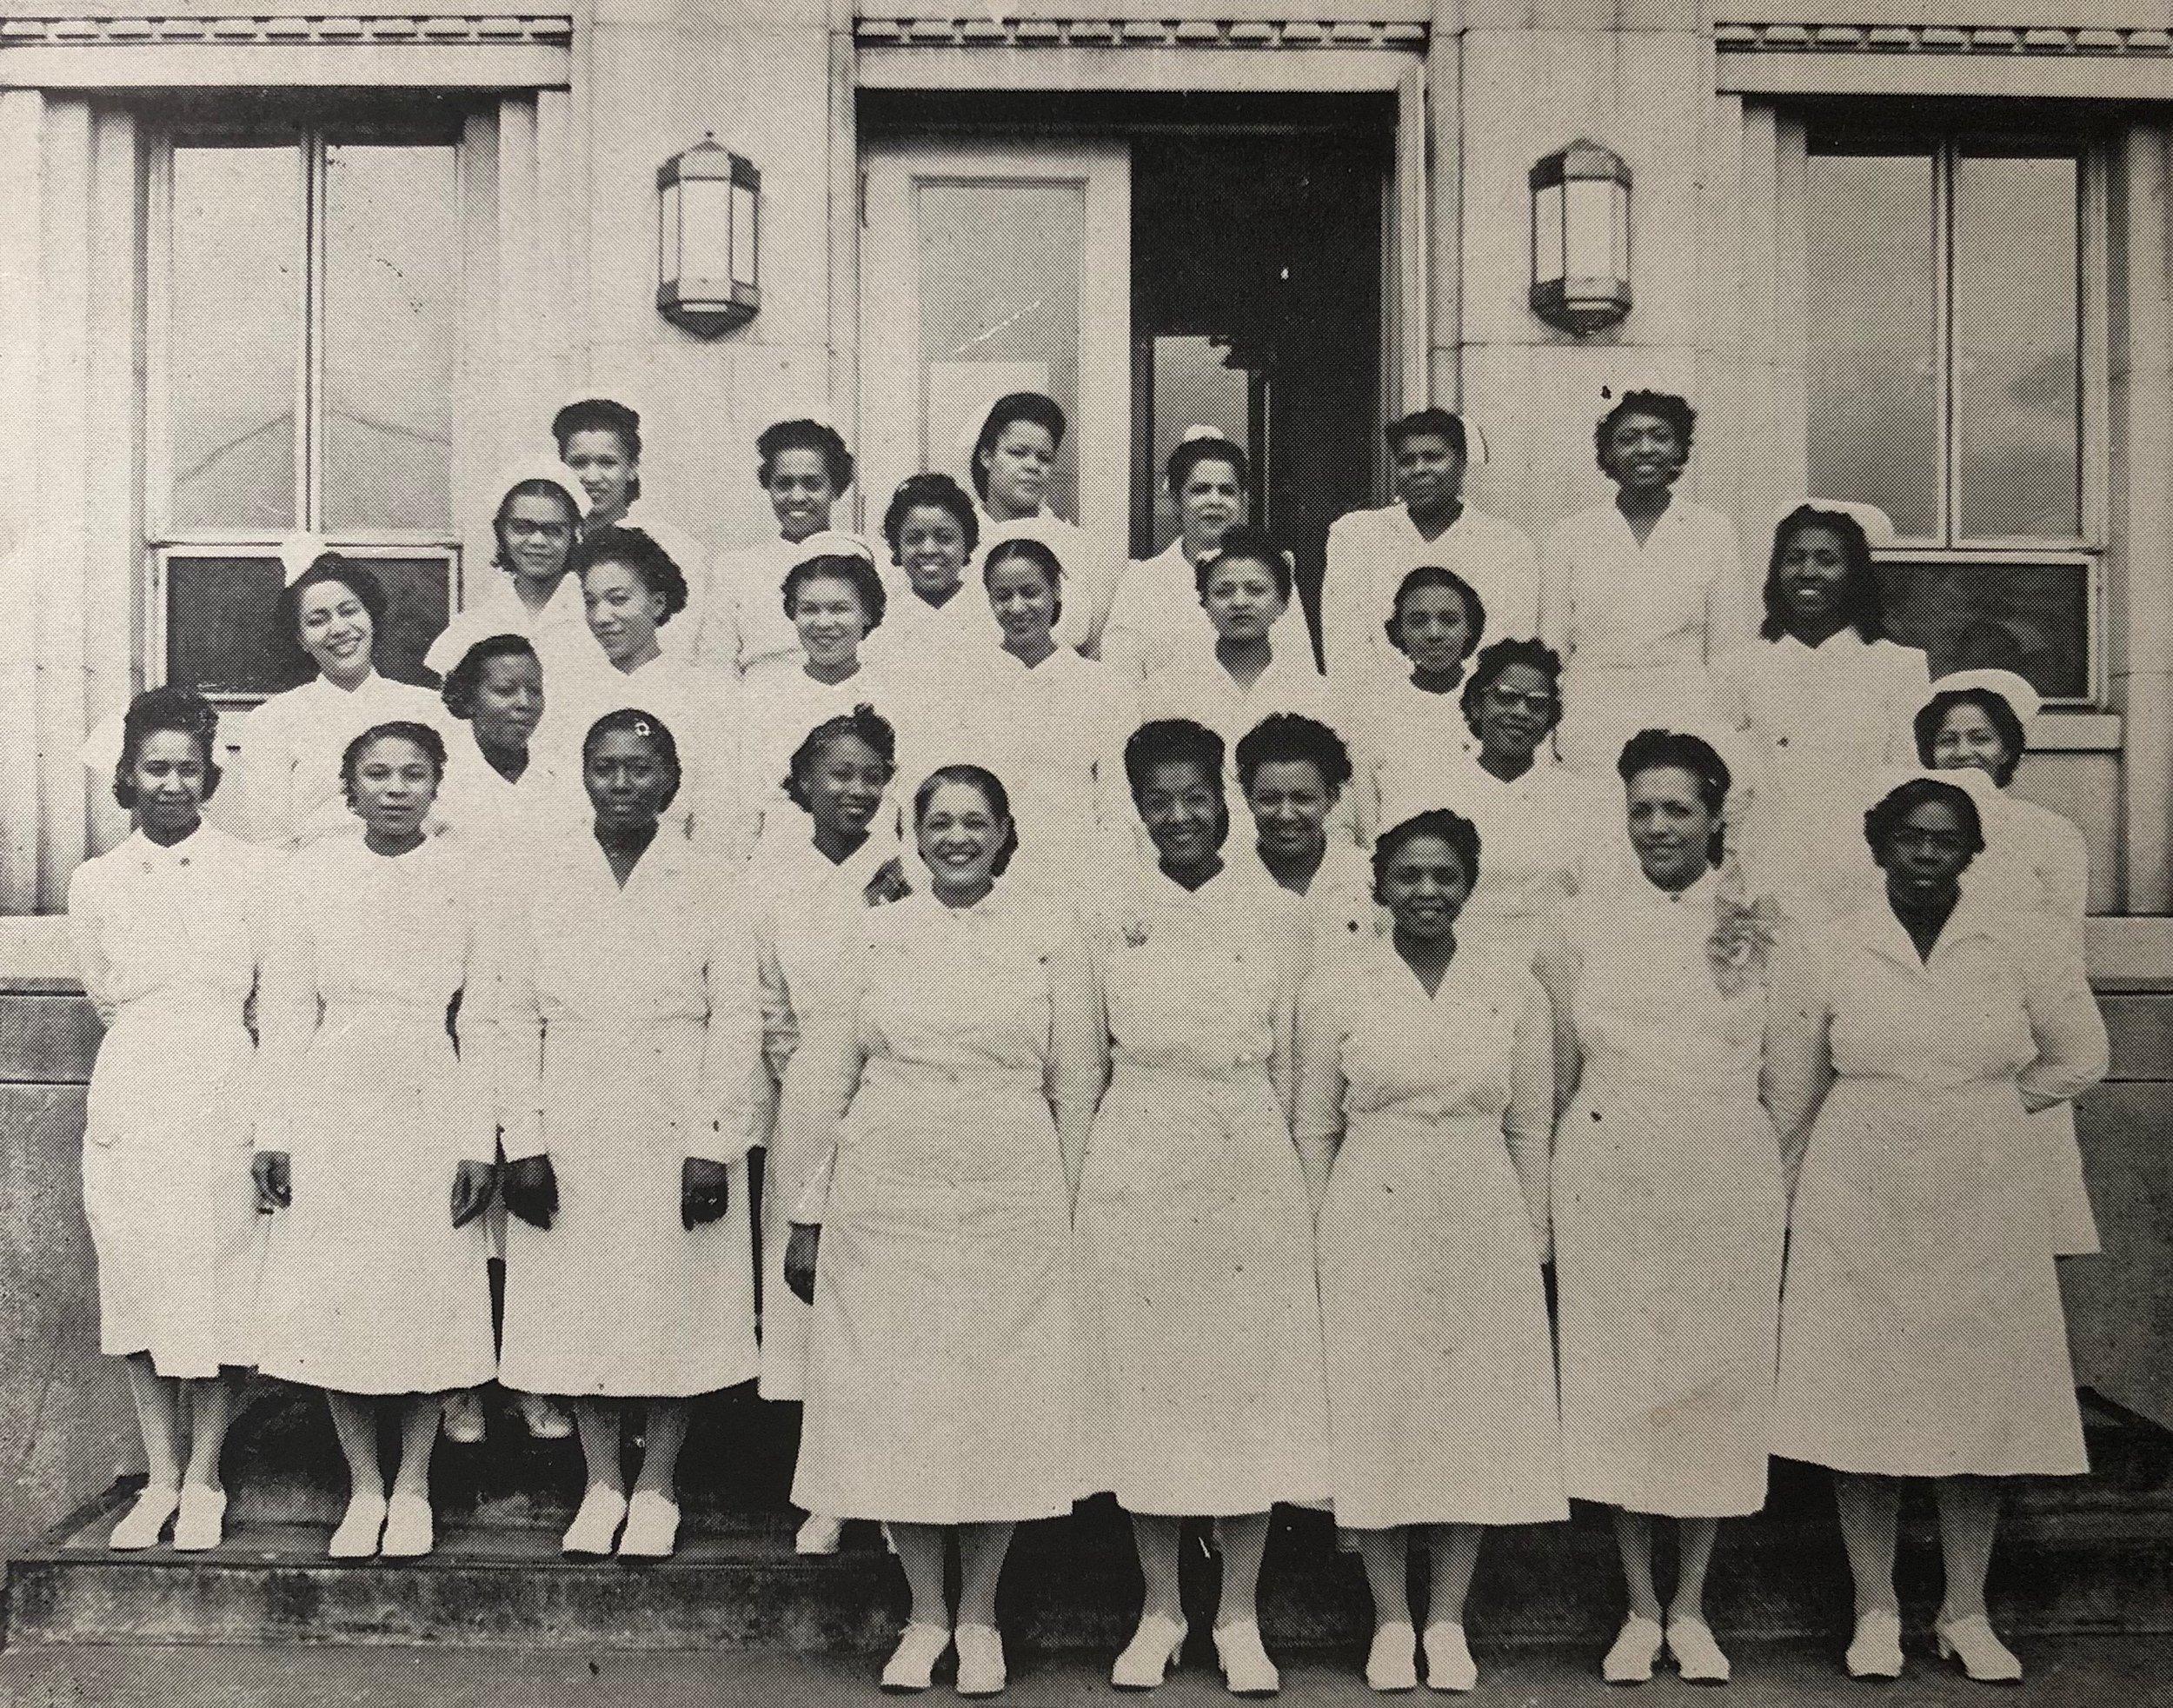 1949 Graduate nursing staff of Kate Bitting Reynolds Memorial Hospital. Photo and thumbnail courtesy of Linda Dark